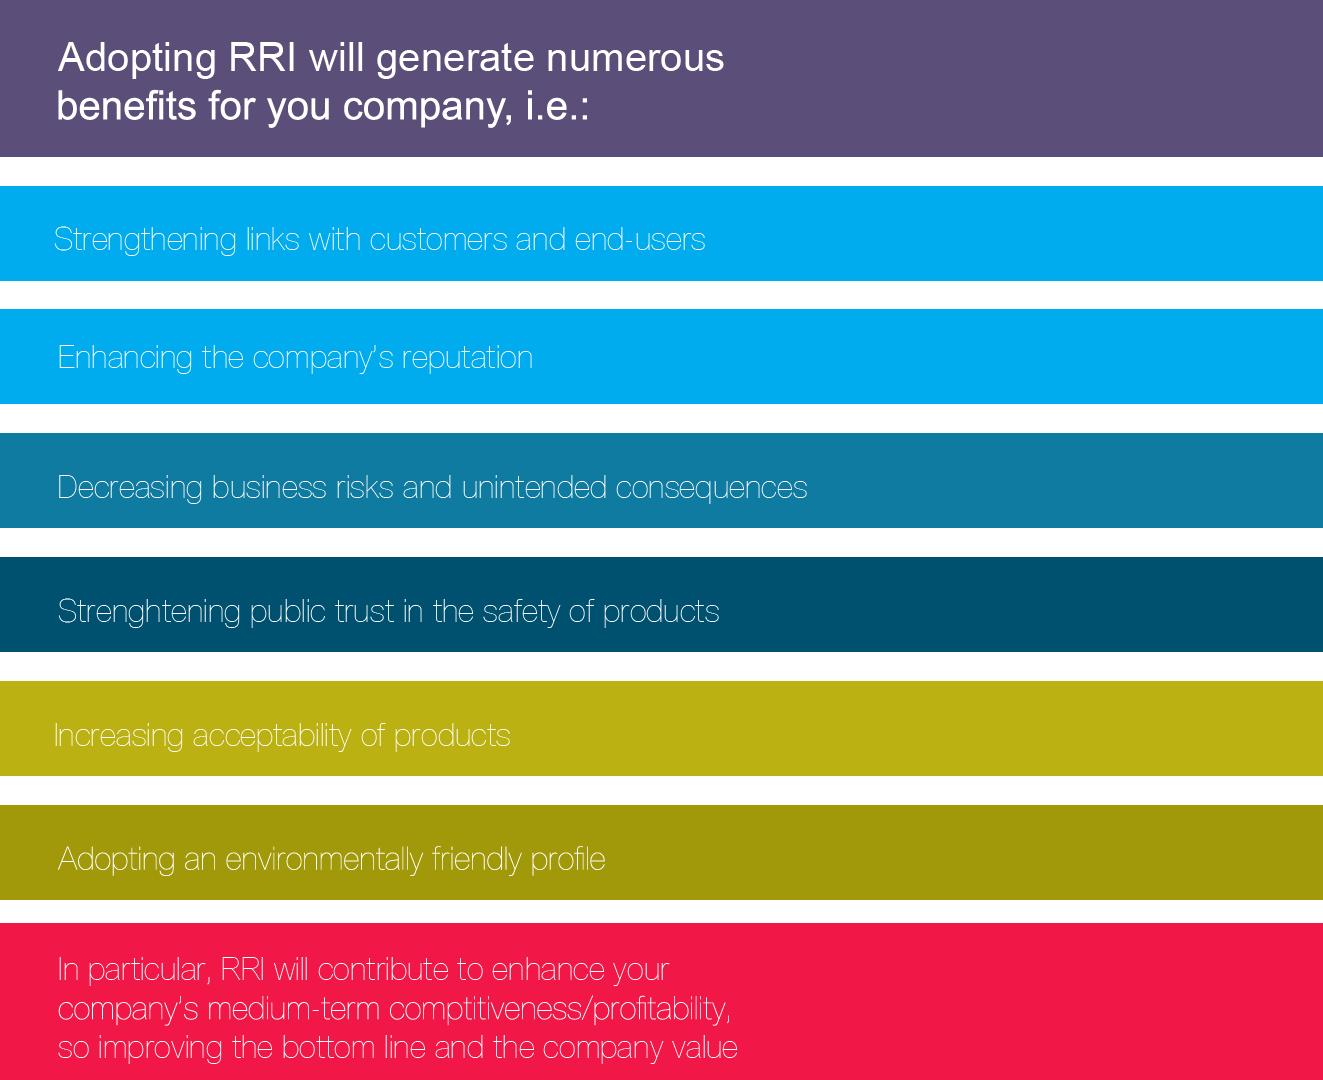 Benefits_of_RRI (1)